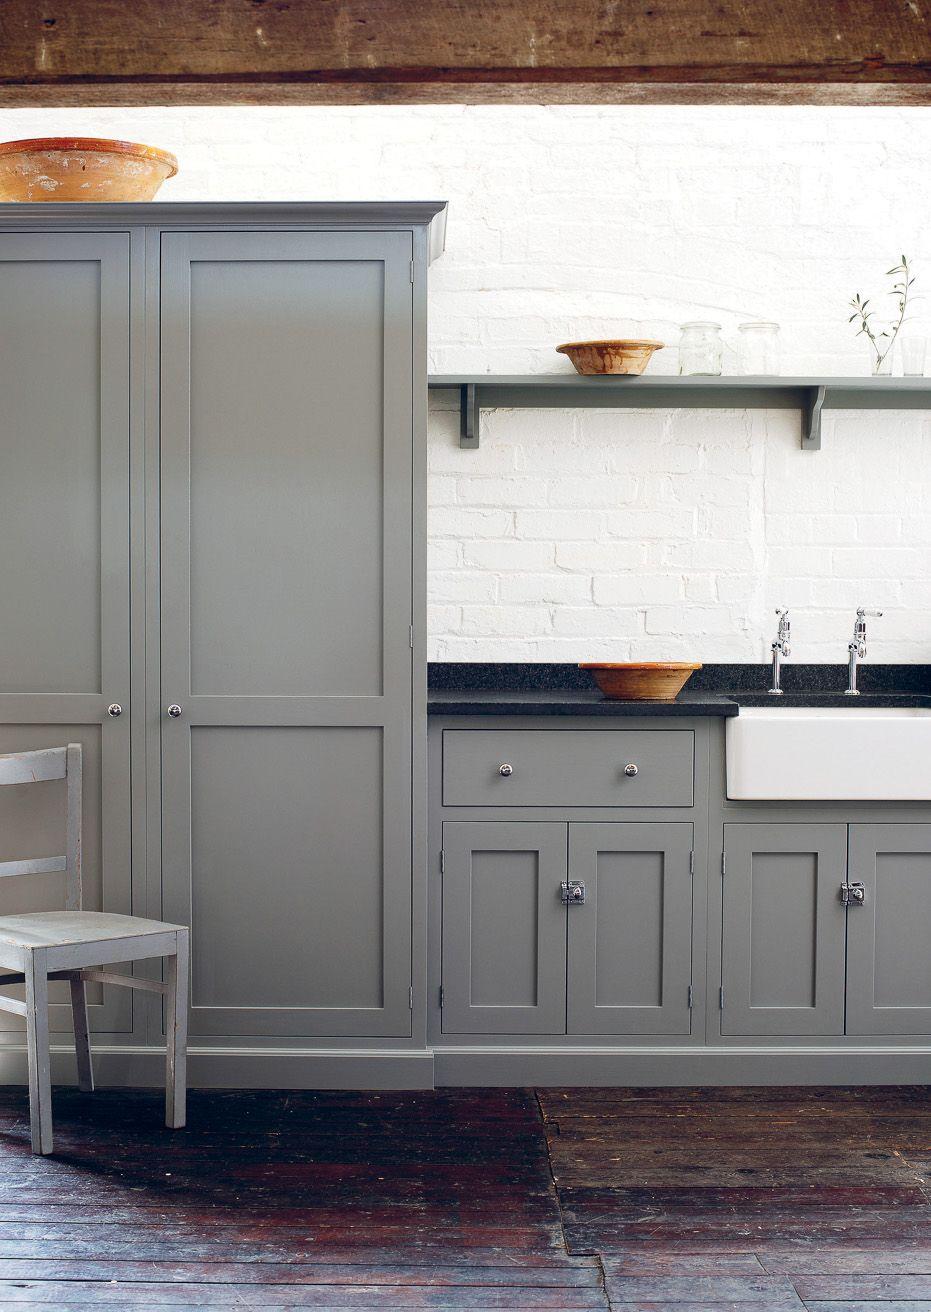 shaker brochure devol kitchens and interiors keitti pinterest k chen inspiration k che. Black Bedroom Furniture Sets. Home Design Ideas